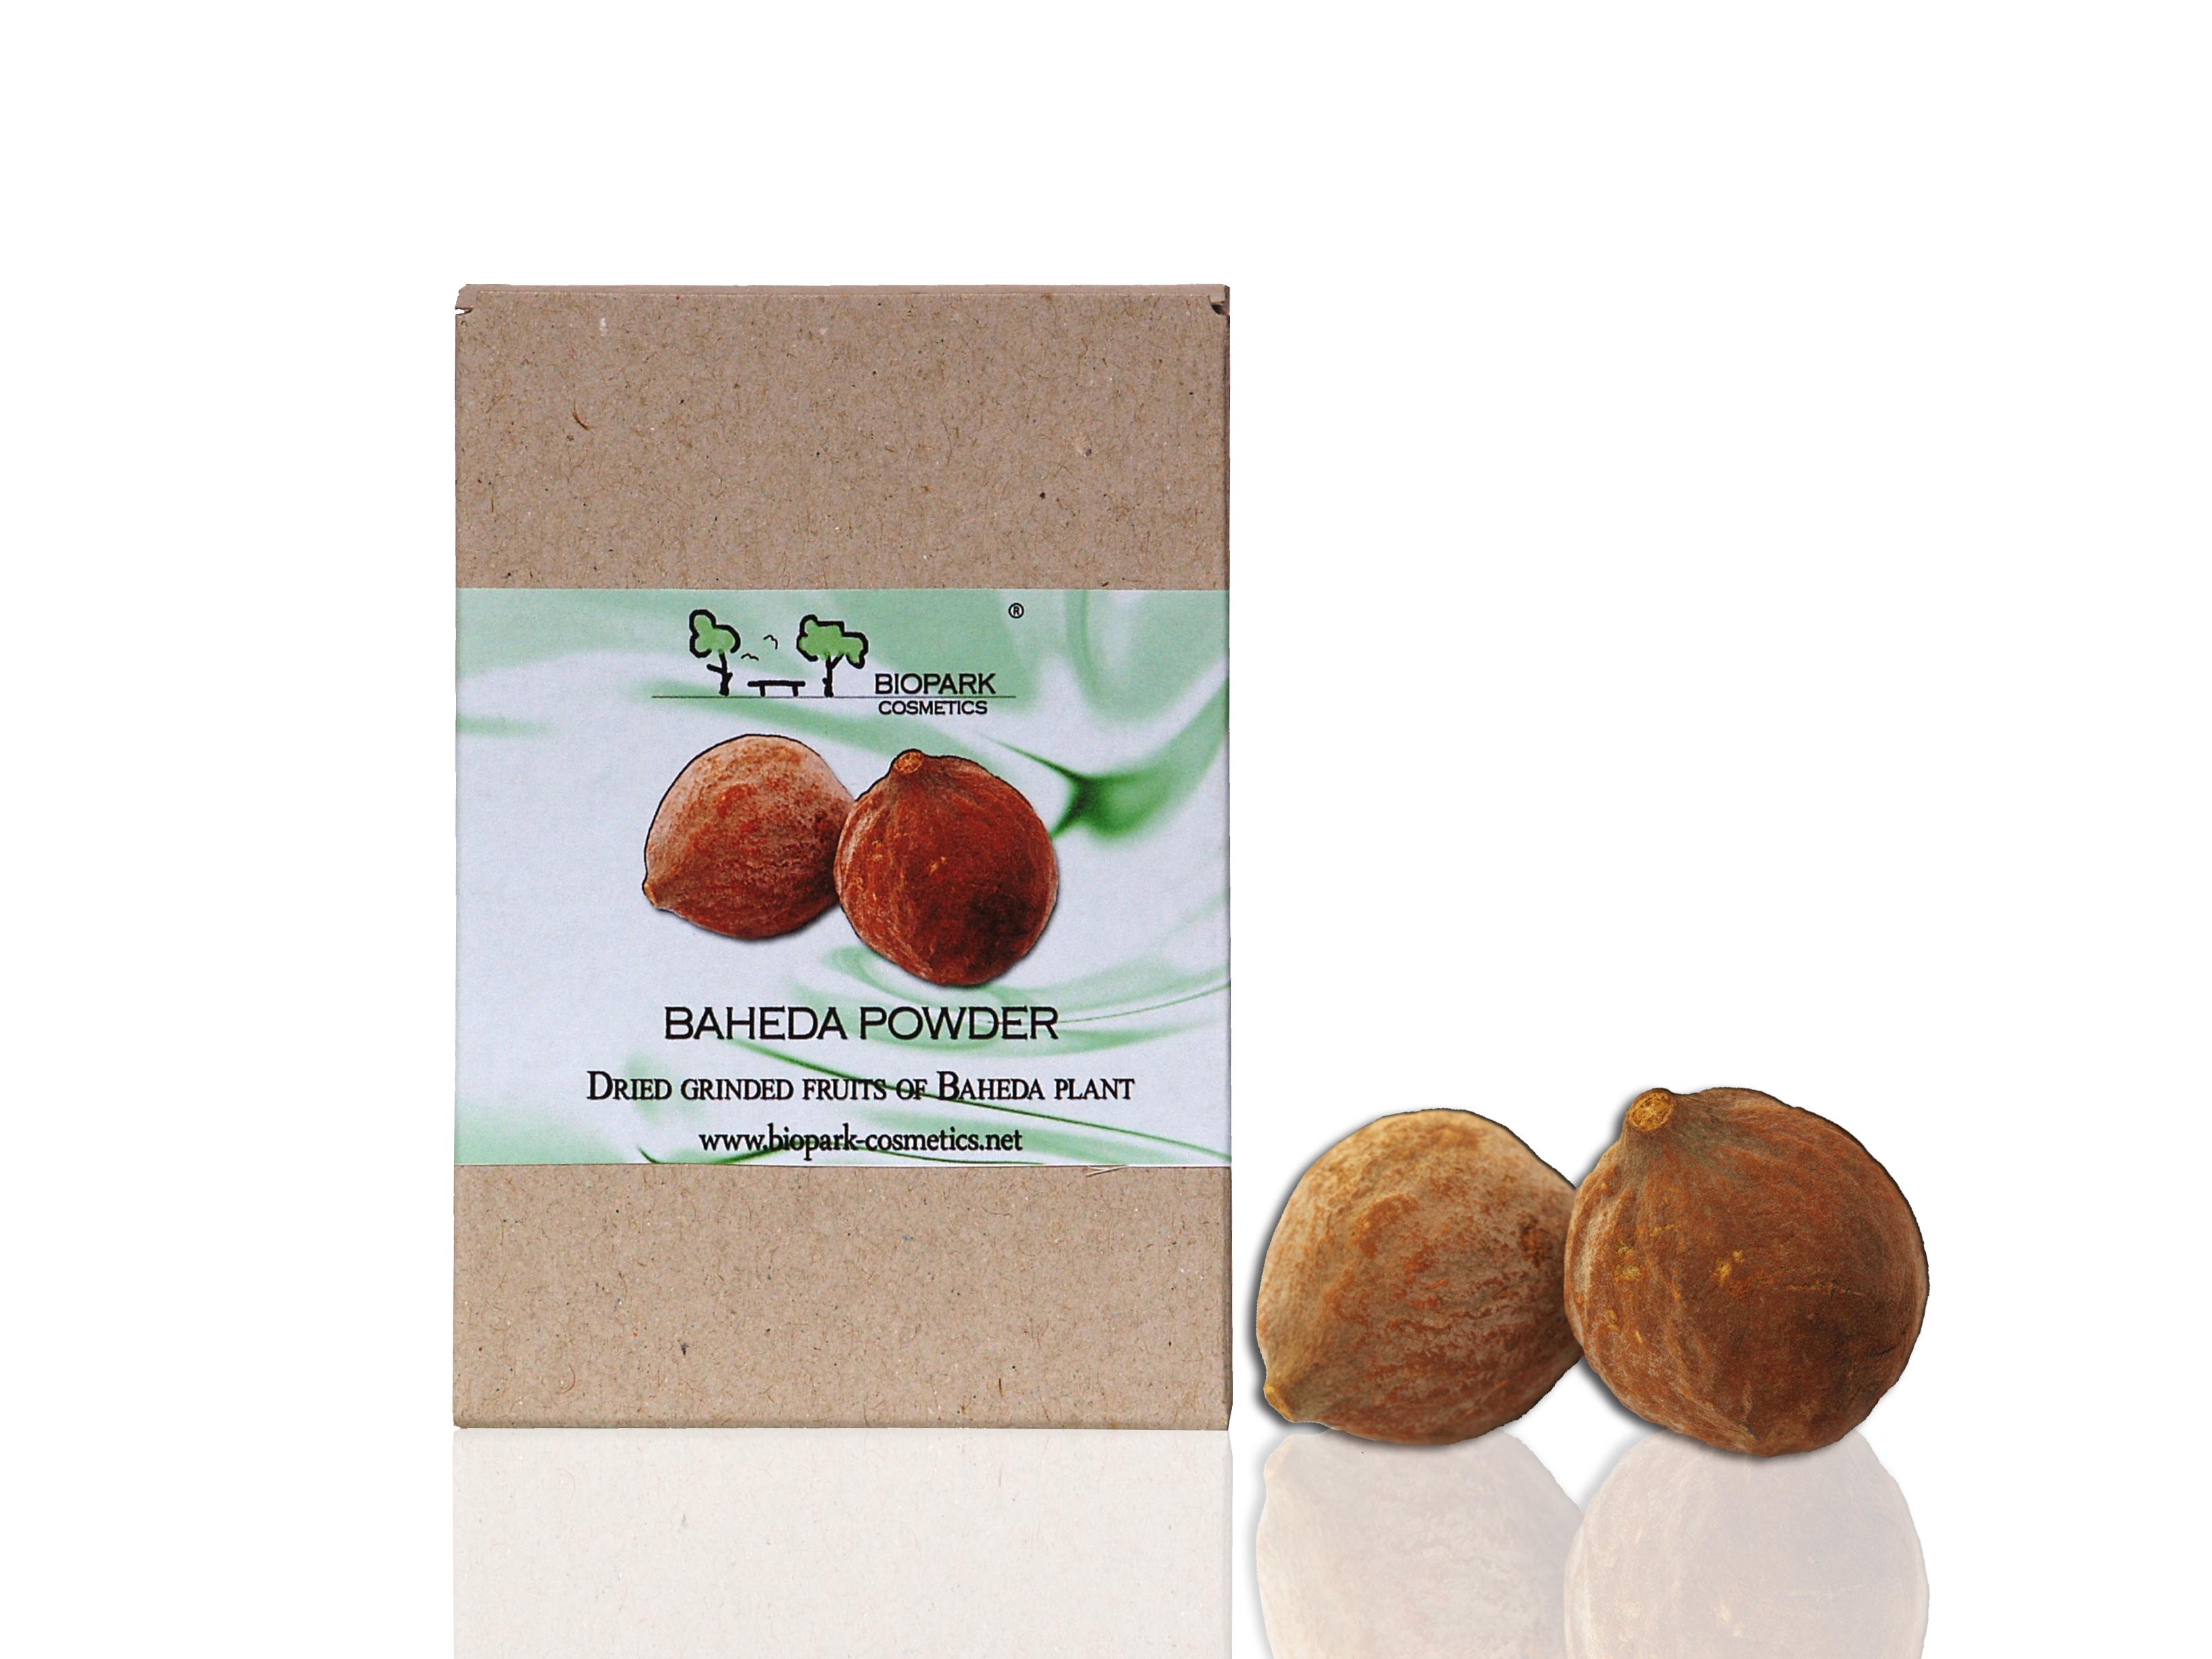 Baheda-Pure 100g